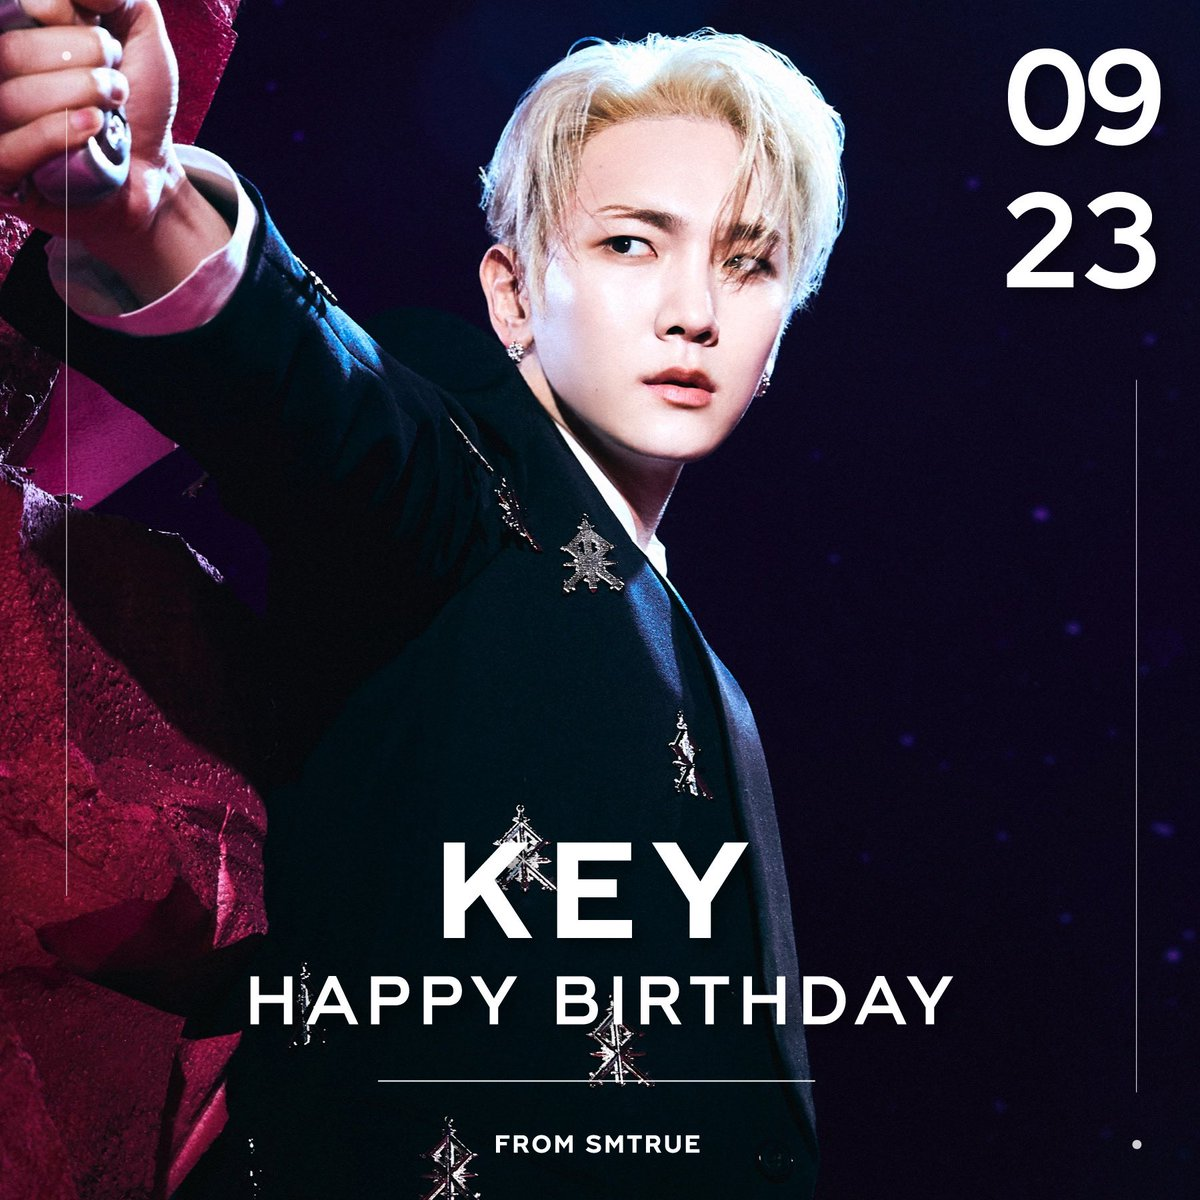 RT @SMTrueThailand: #HappyKEYDay 🎂🎉  23.09.2021  สุขสันต์วันเกิด 'KEY' 💎  #KEY #키 #SHINee #샤이니...